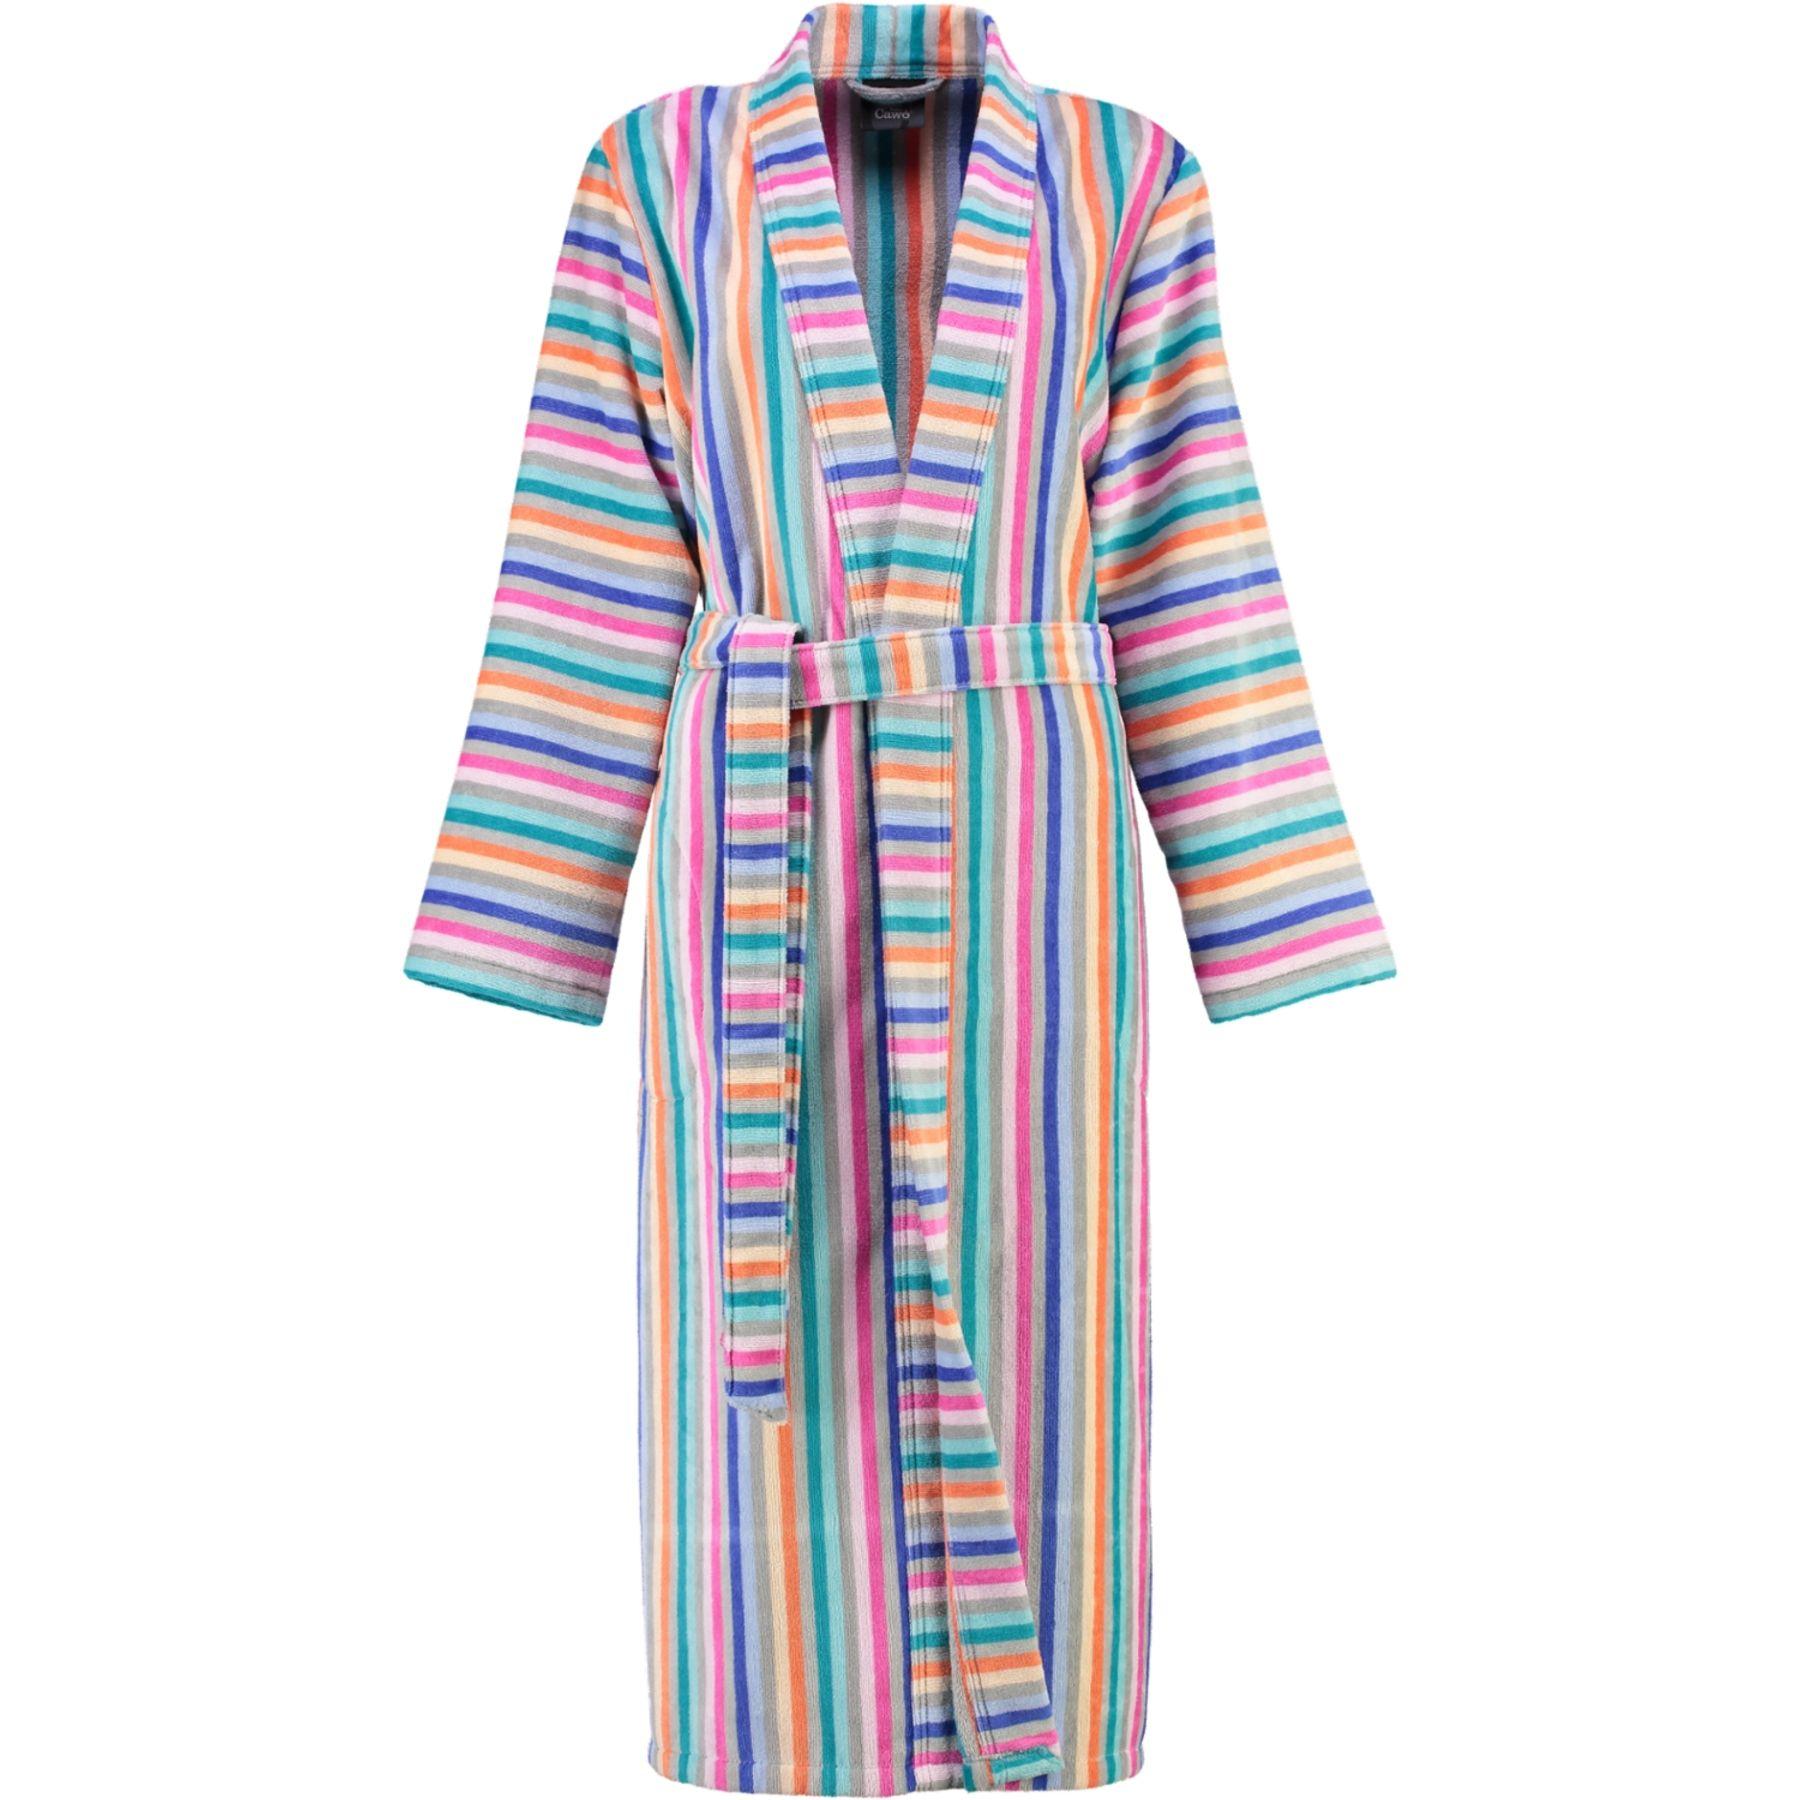 Cawö - Damen Walkvelours-Bademantel in Kimono-Form, gestreift (4342) – Bild 1